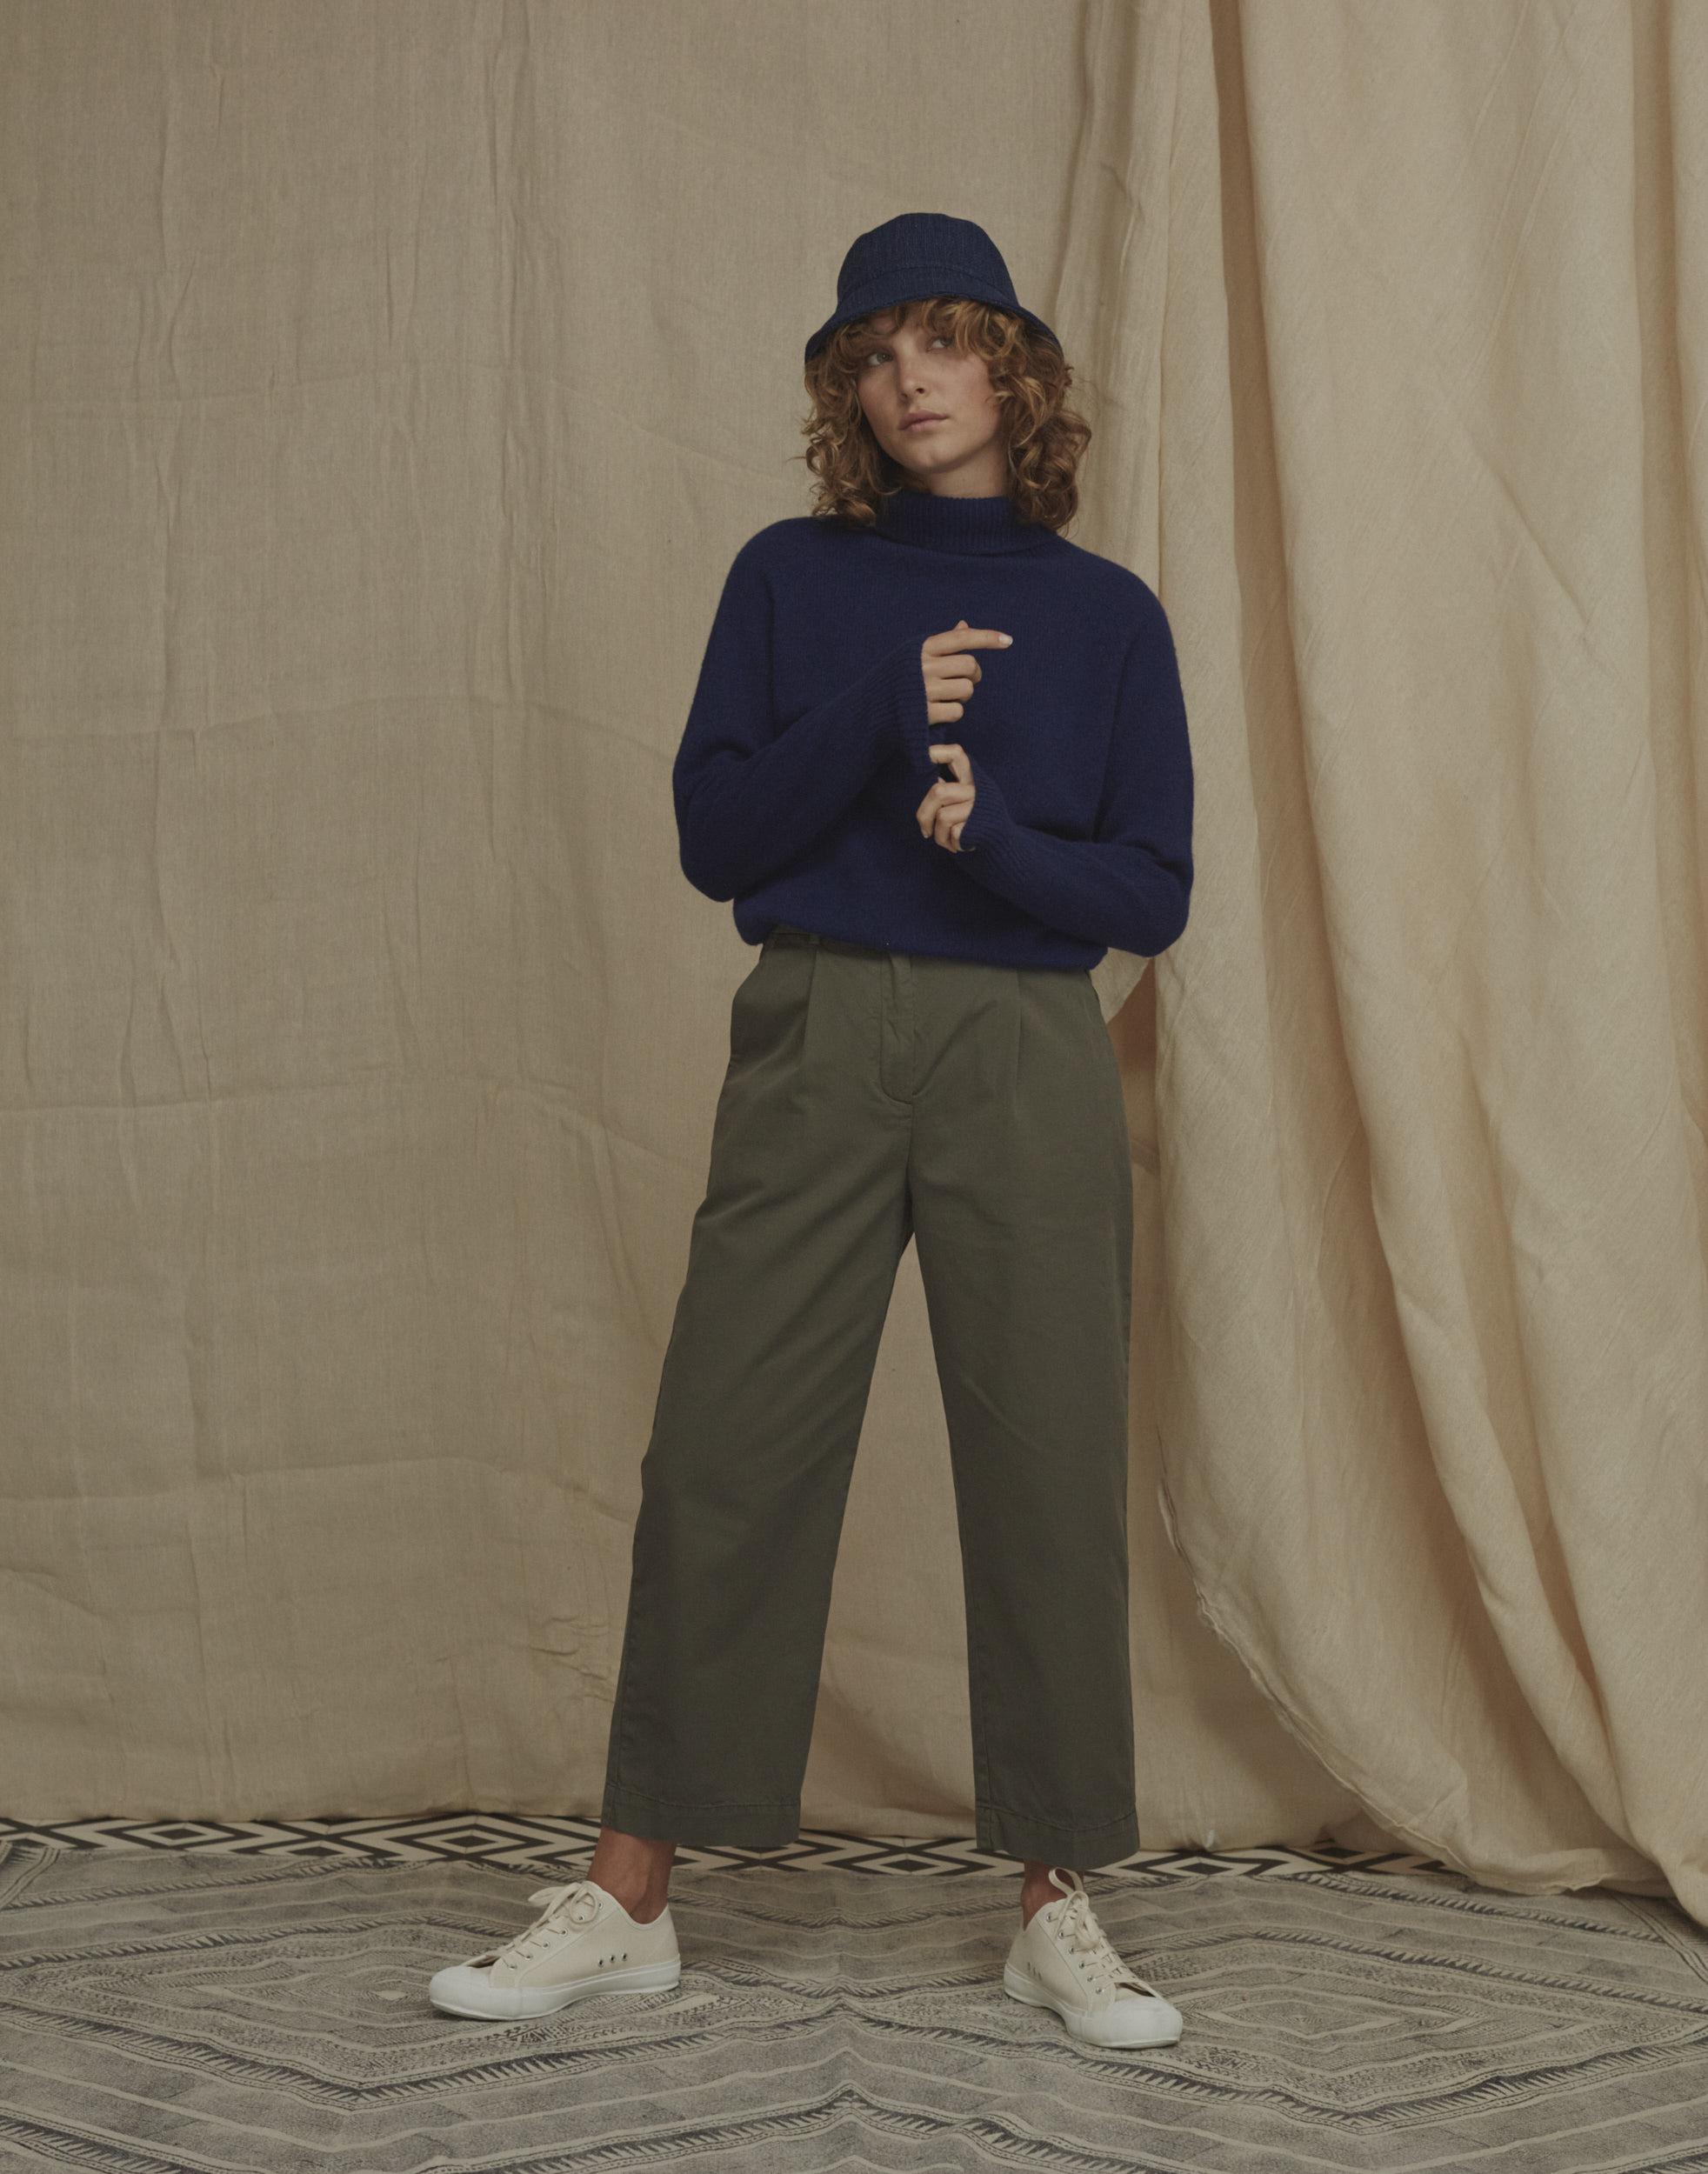 ymc-ss17-collection-okoro-women-fashion-folkr-11